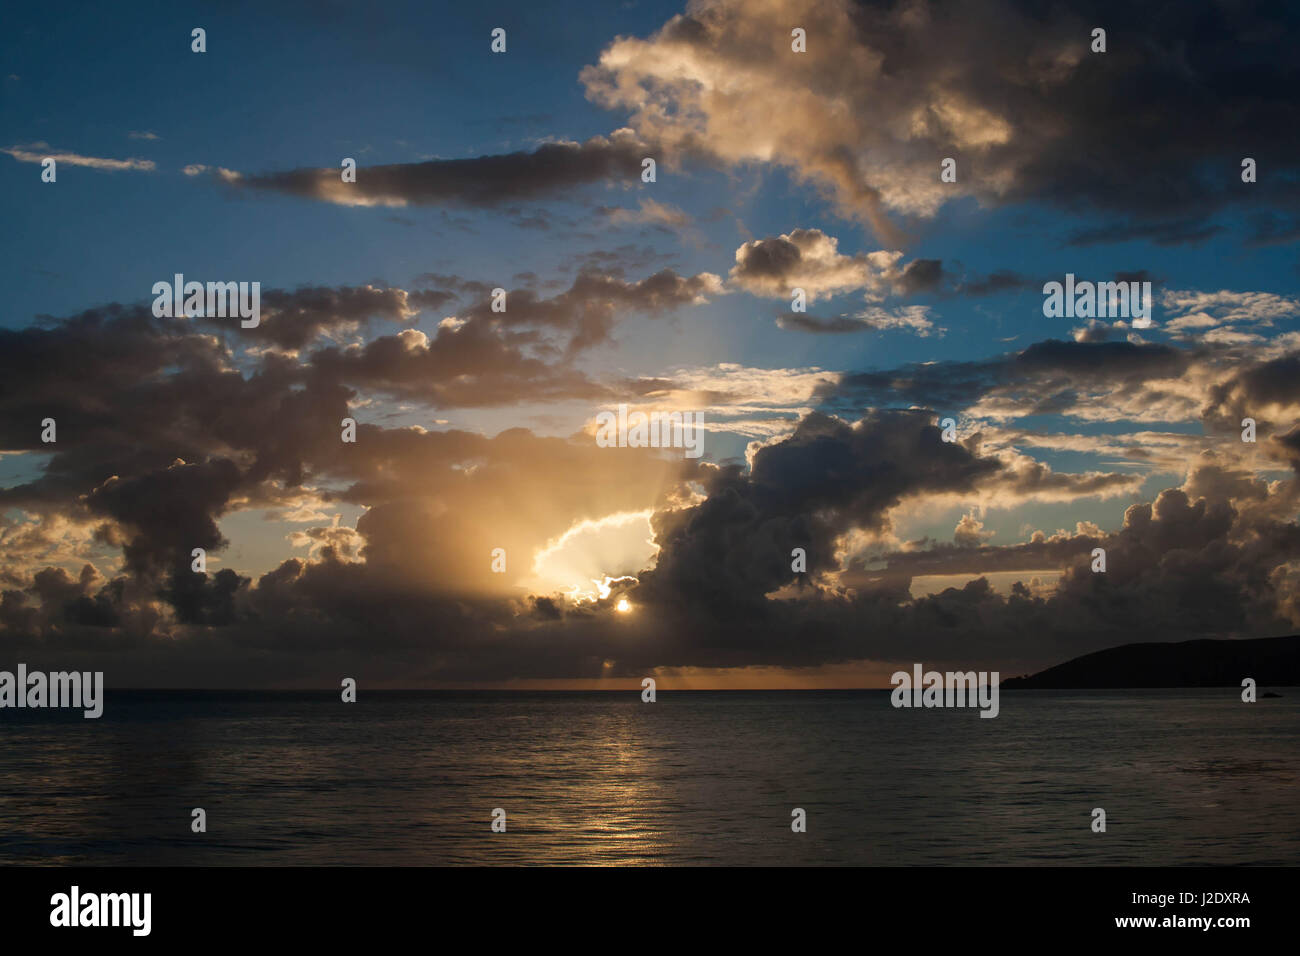 CloudySunset0655   - Stock Image